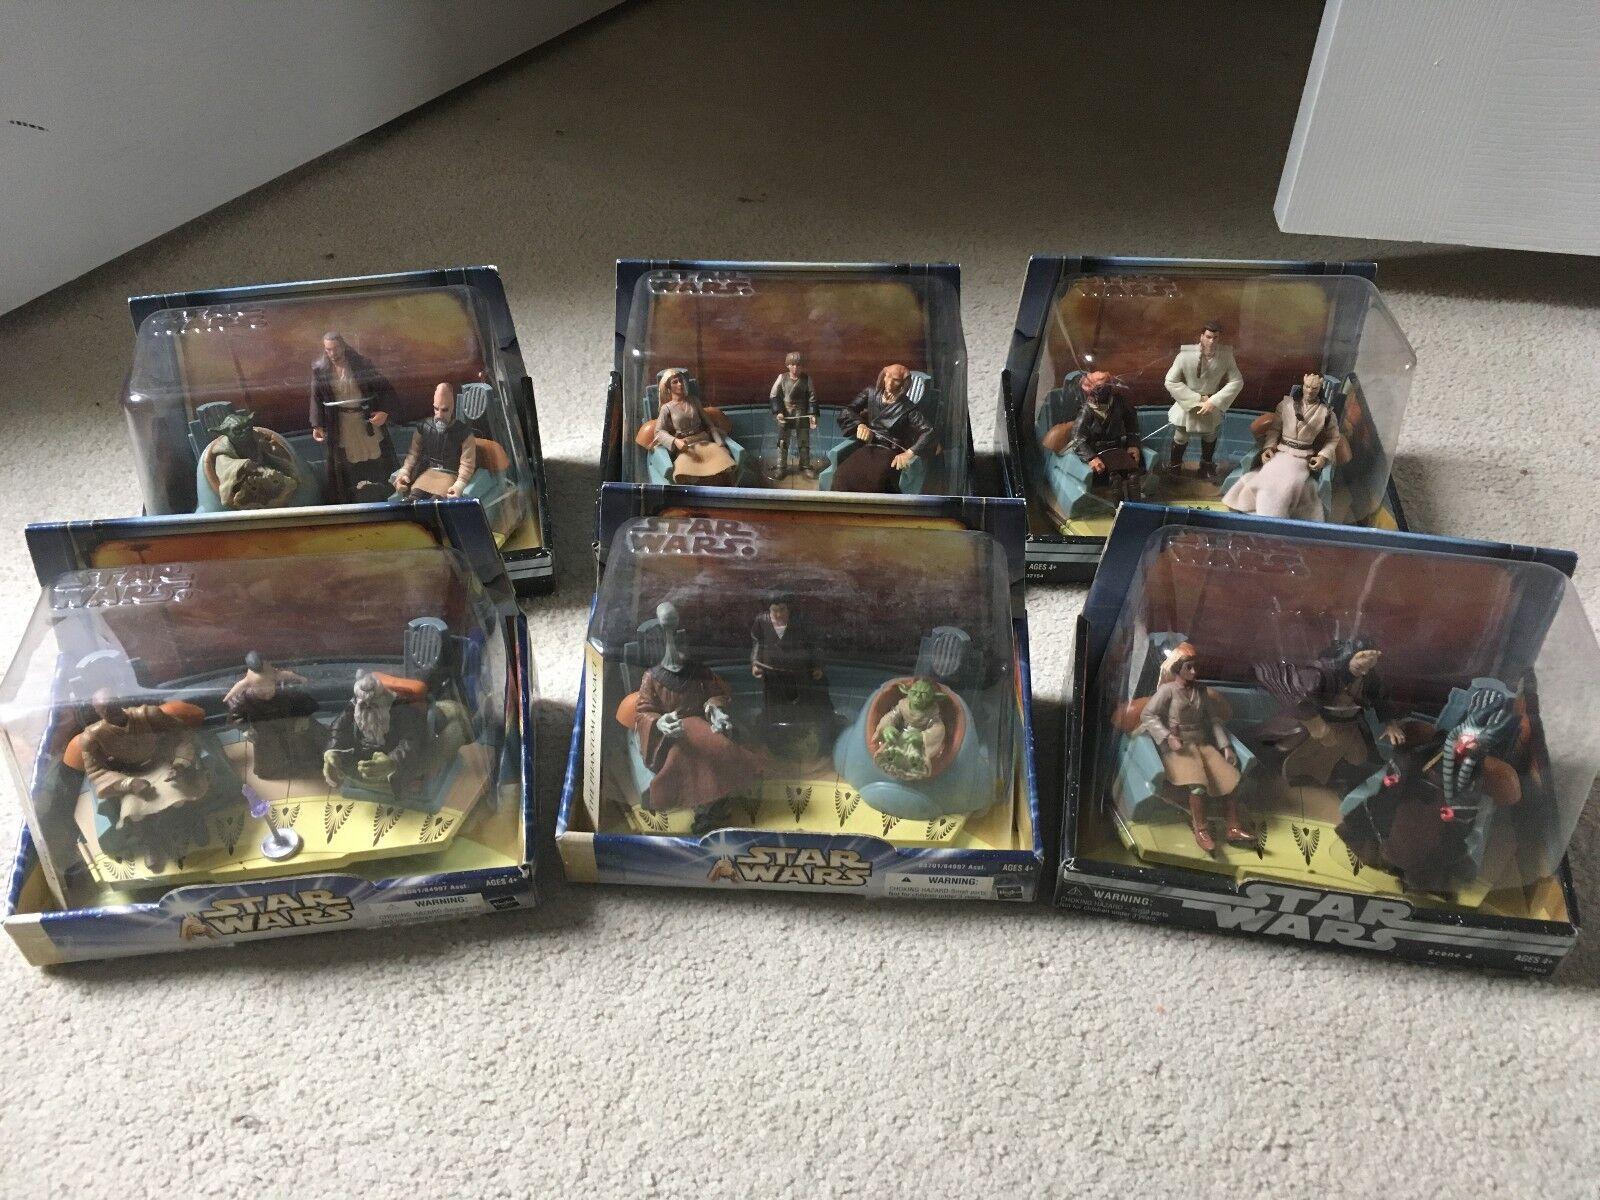 Star Wars Jedi High Council Scene 1, 2, 3, & 4 and Scene 1 & 2 Complete Sets